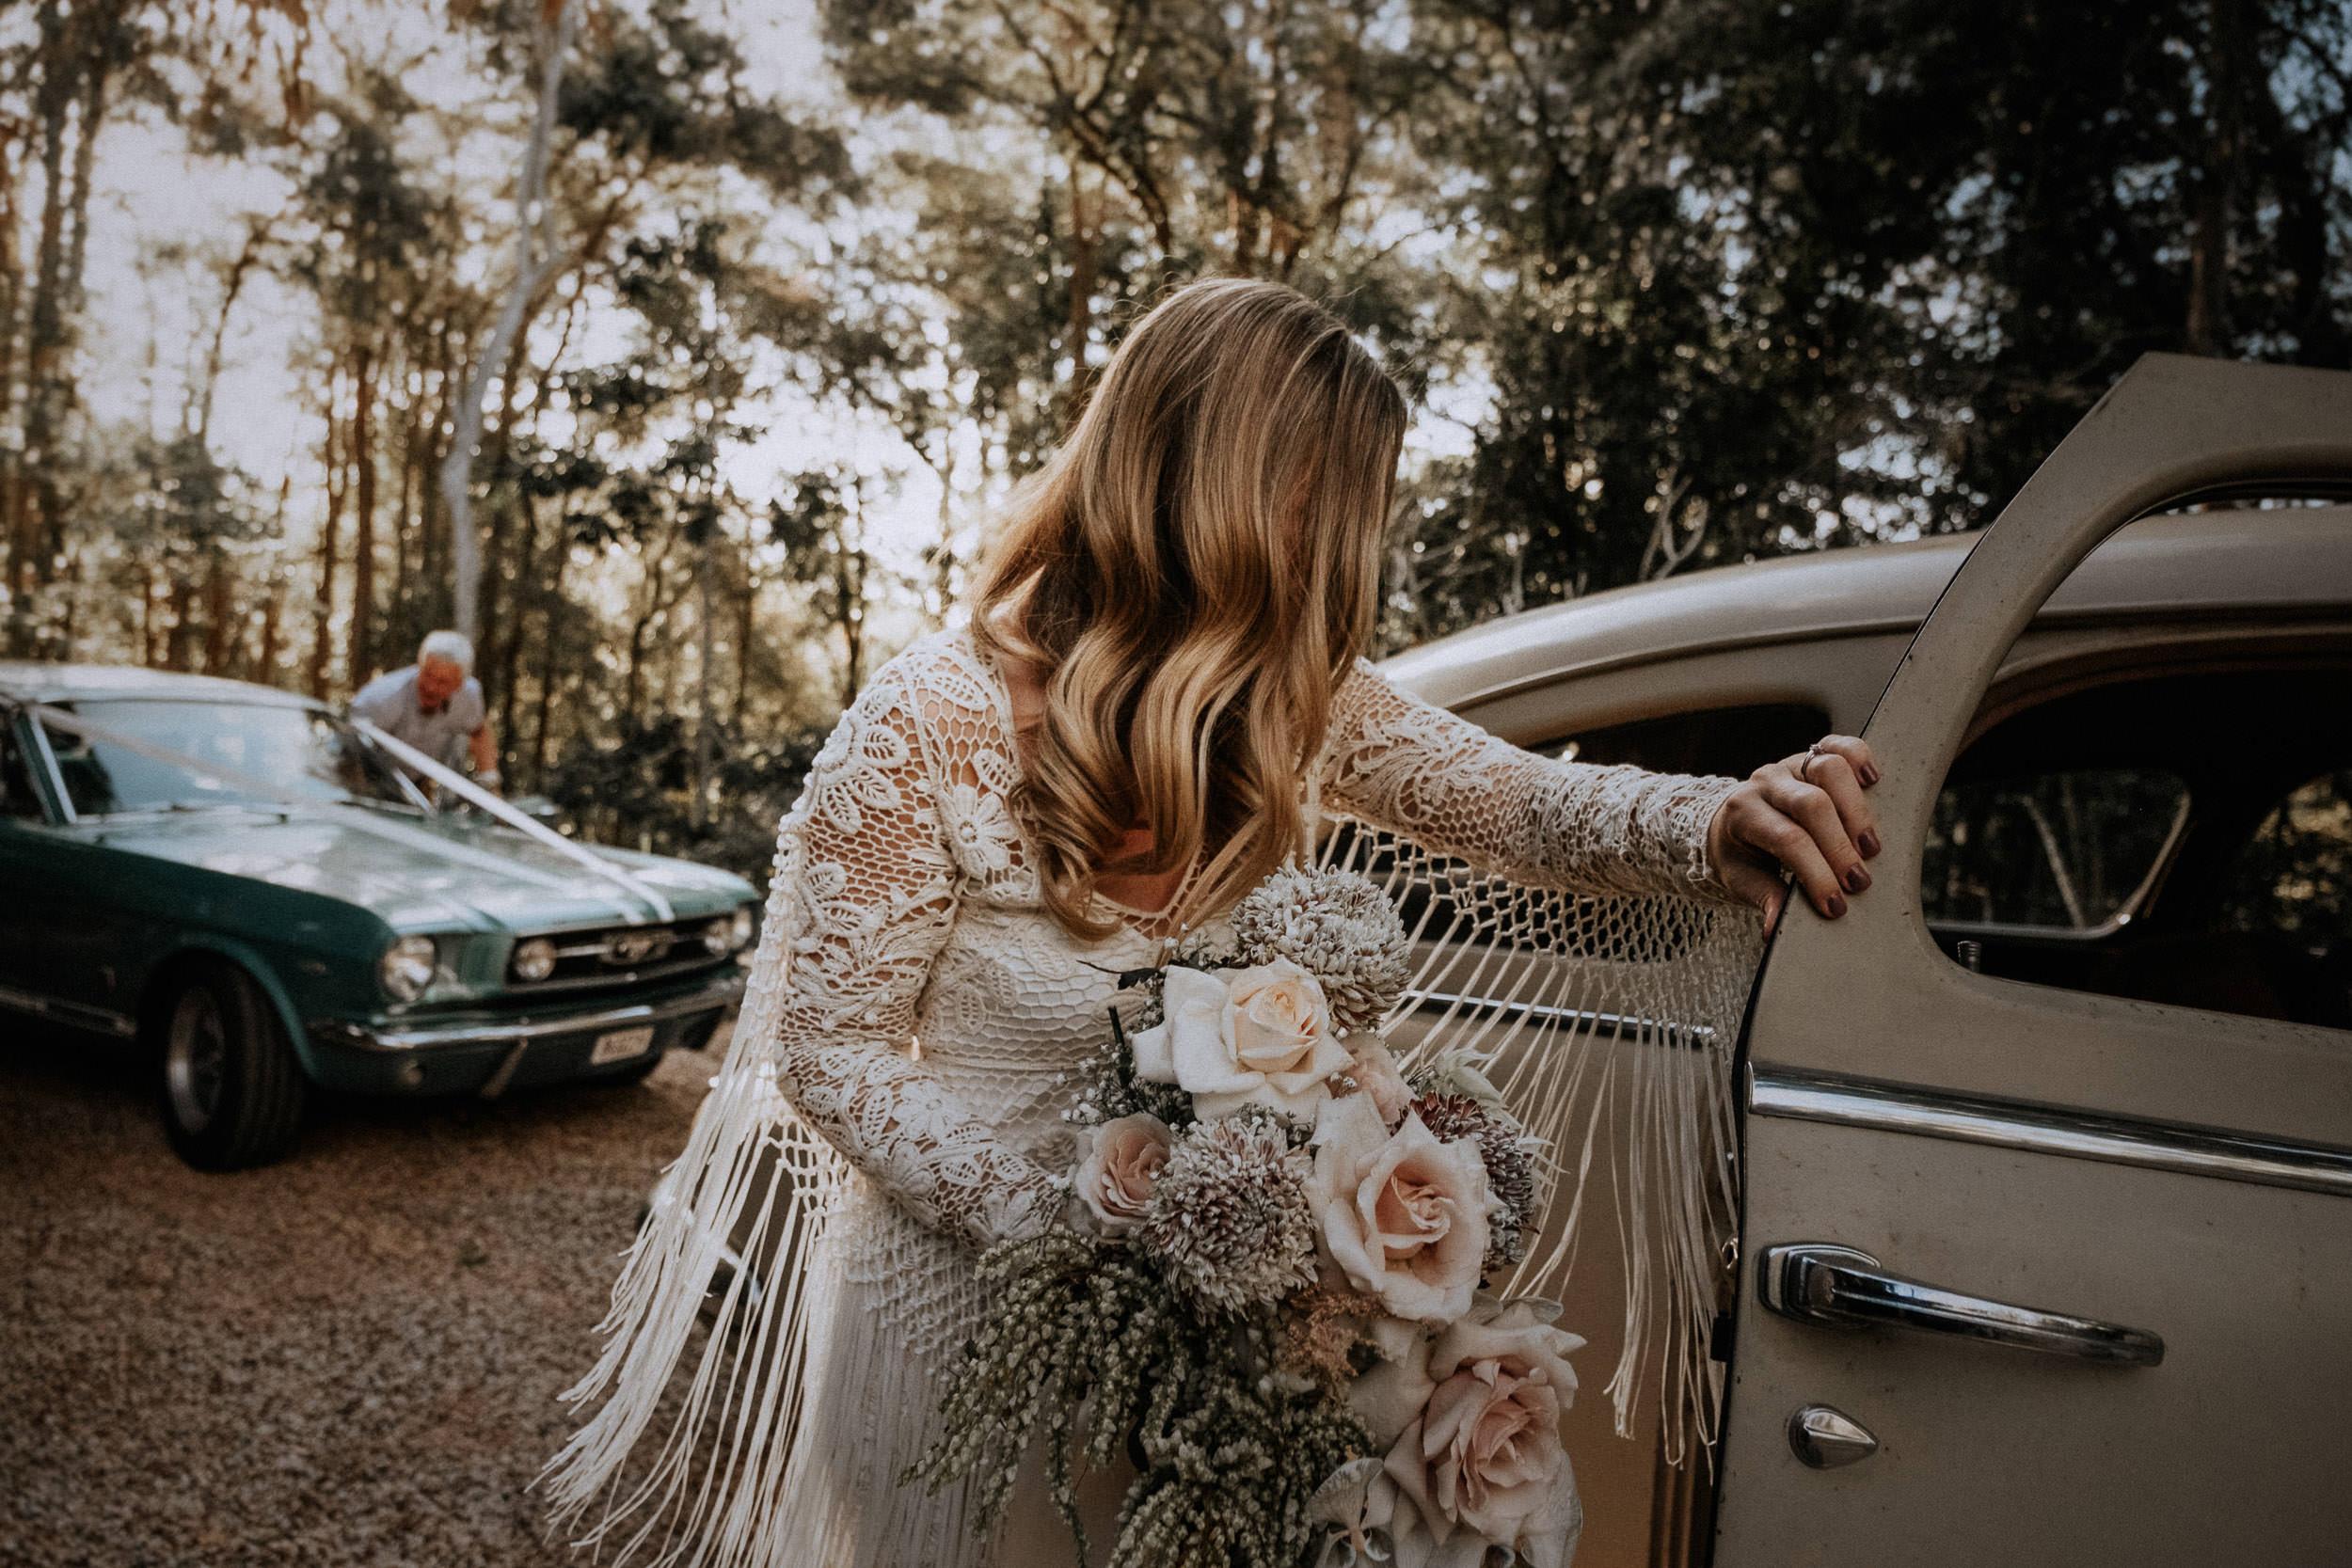 S&A Elopement - Kings & Thieves - Shred 'Til Dead - Central Coast Beach Forest Wedding - 147.jpg